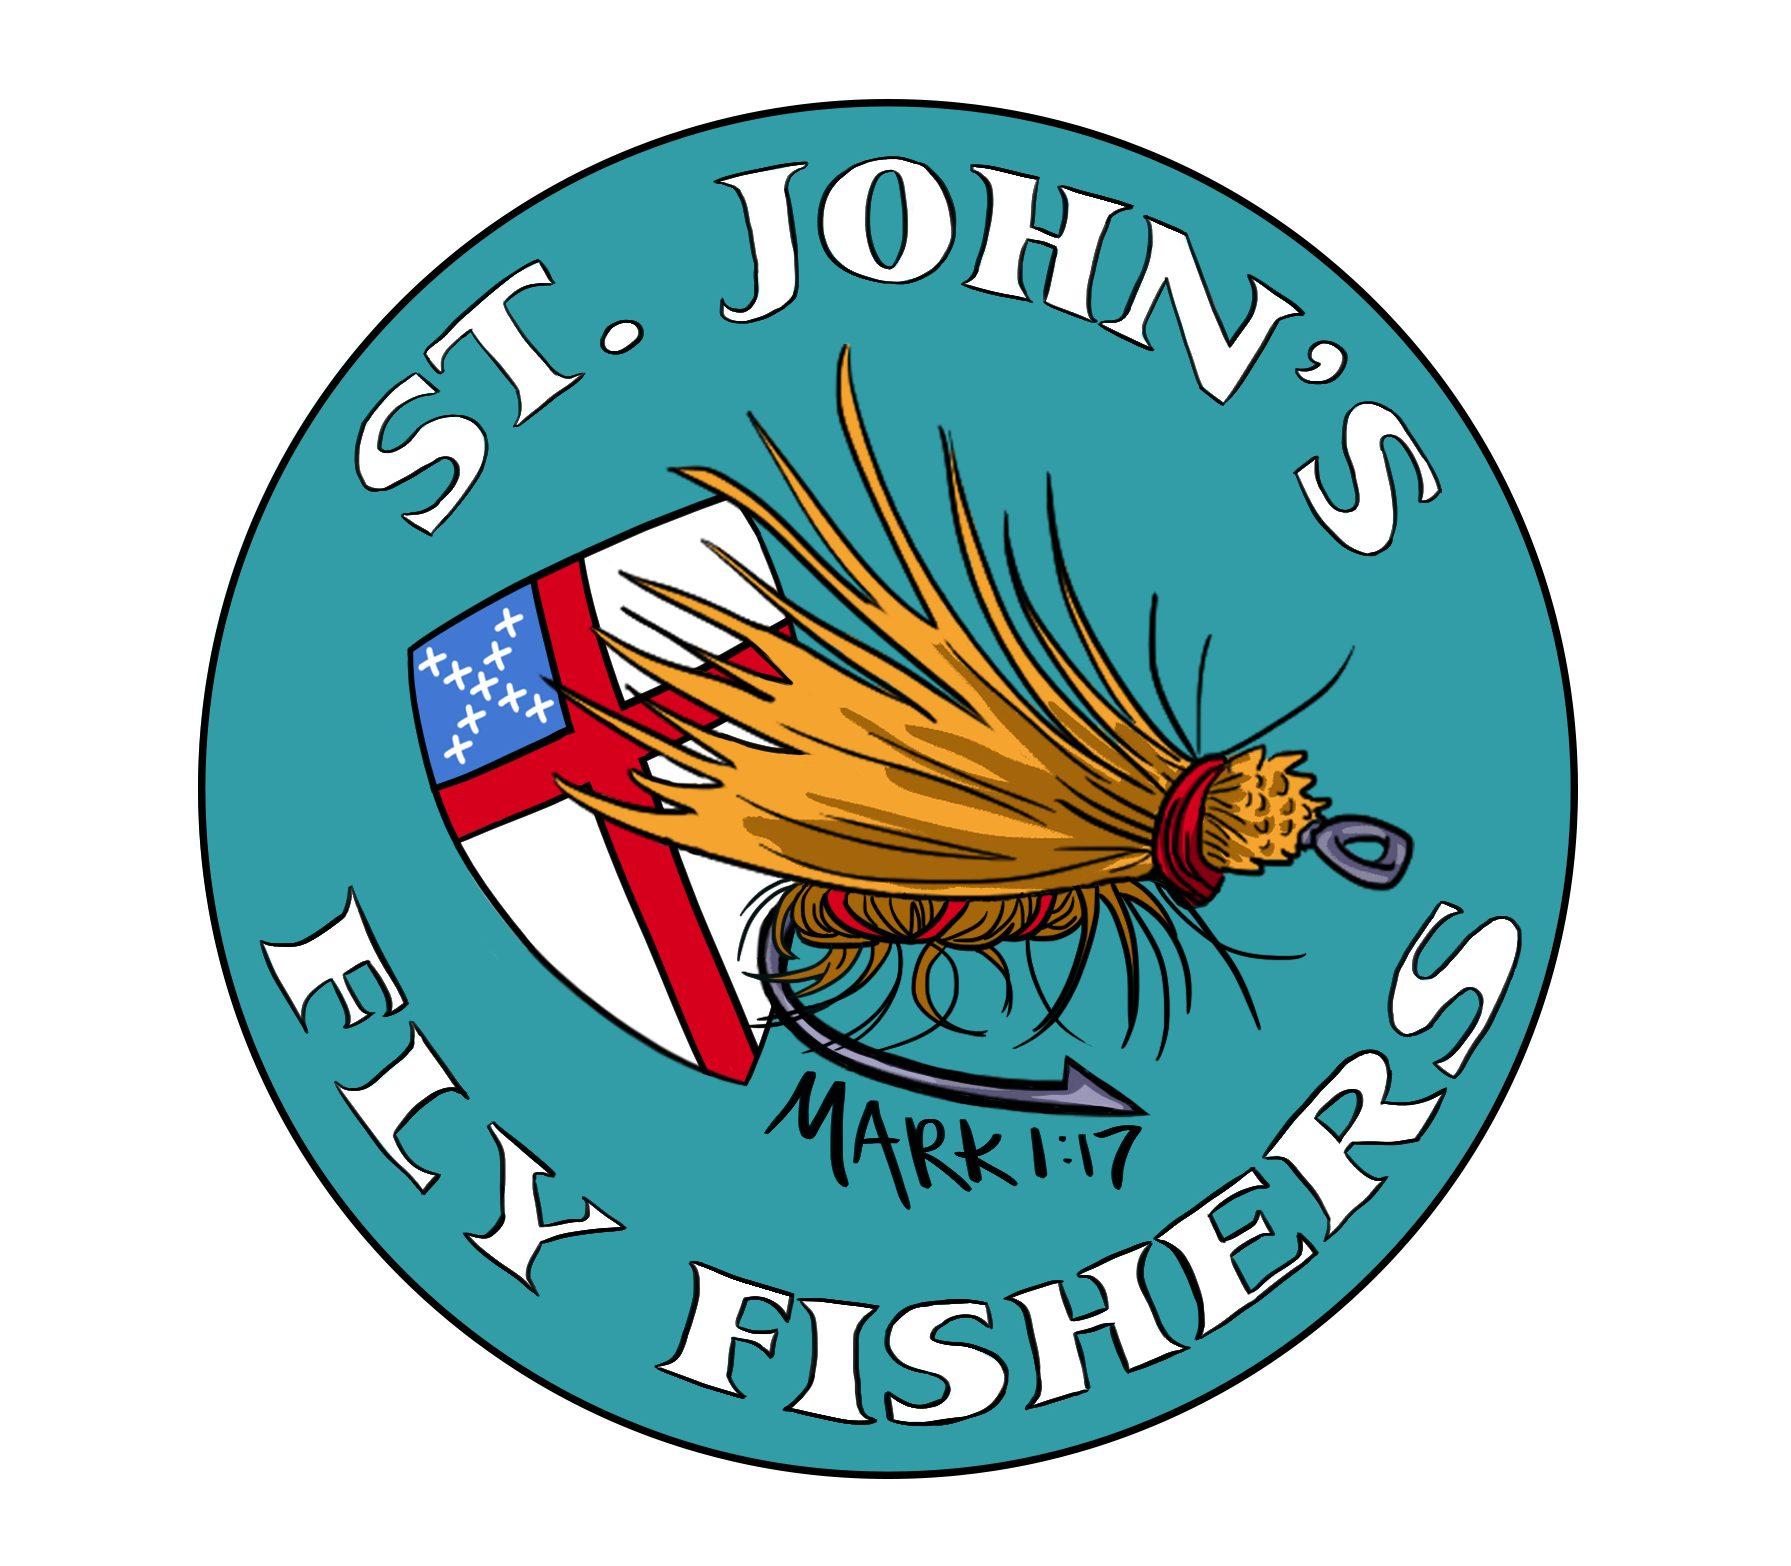 St. John's Fly Fishers